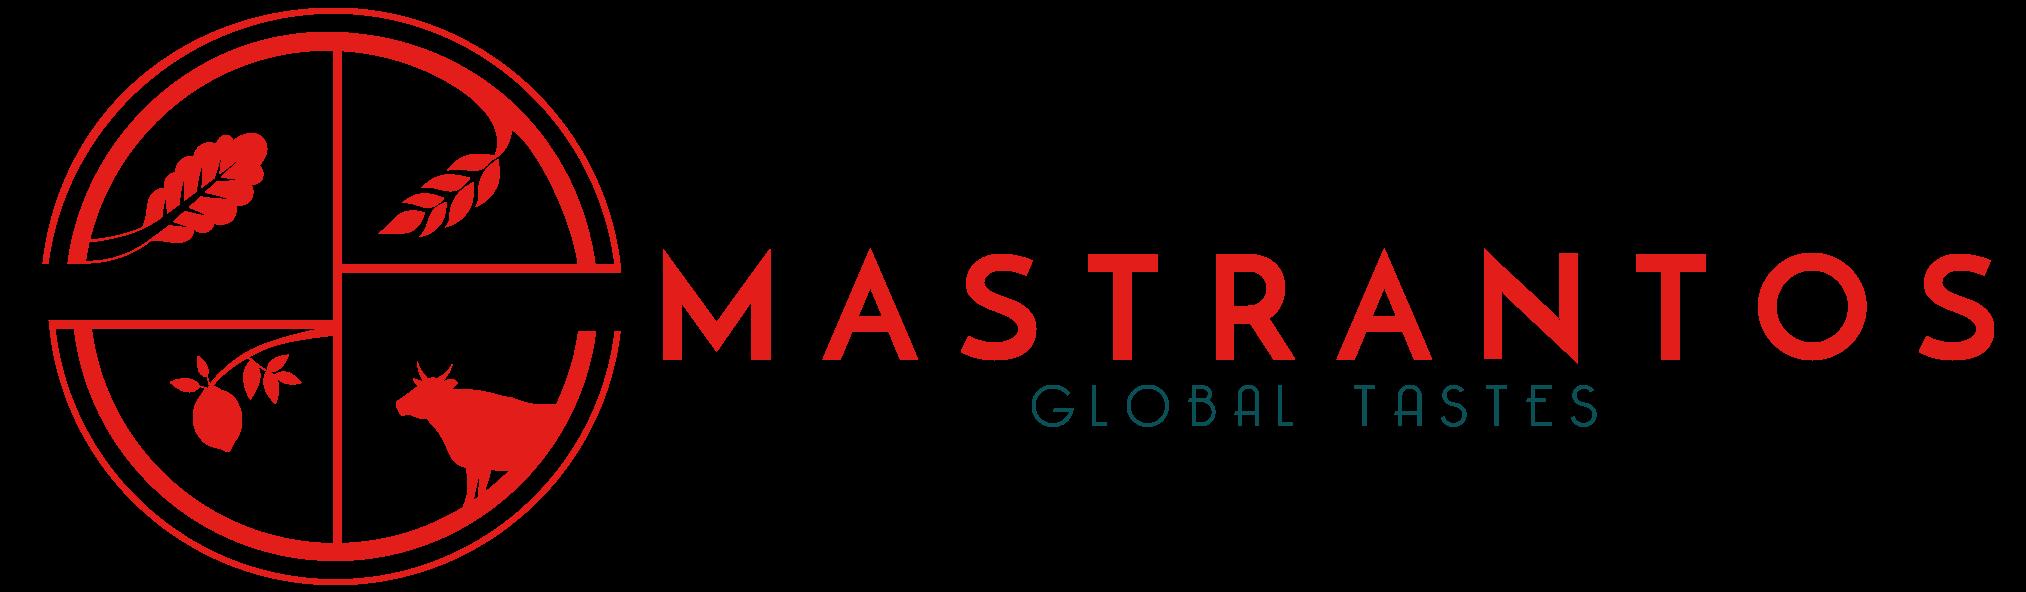 Mastrantos Logo